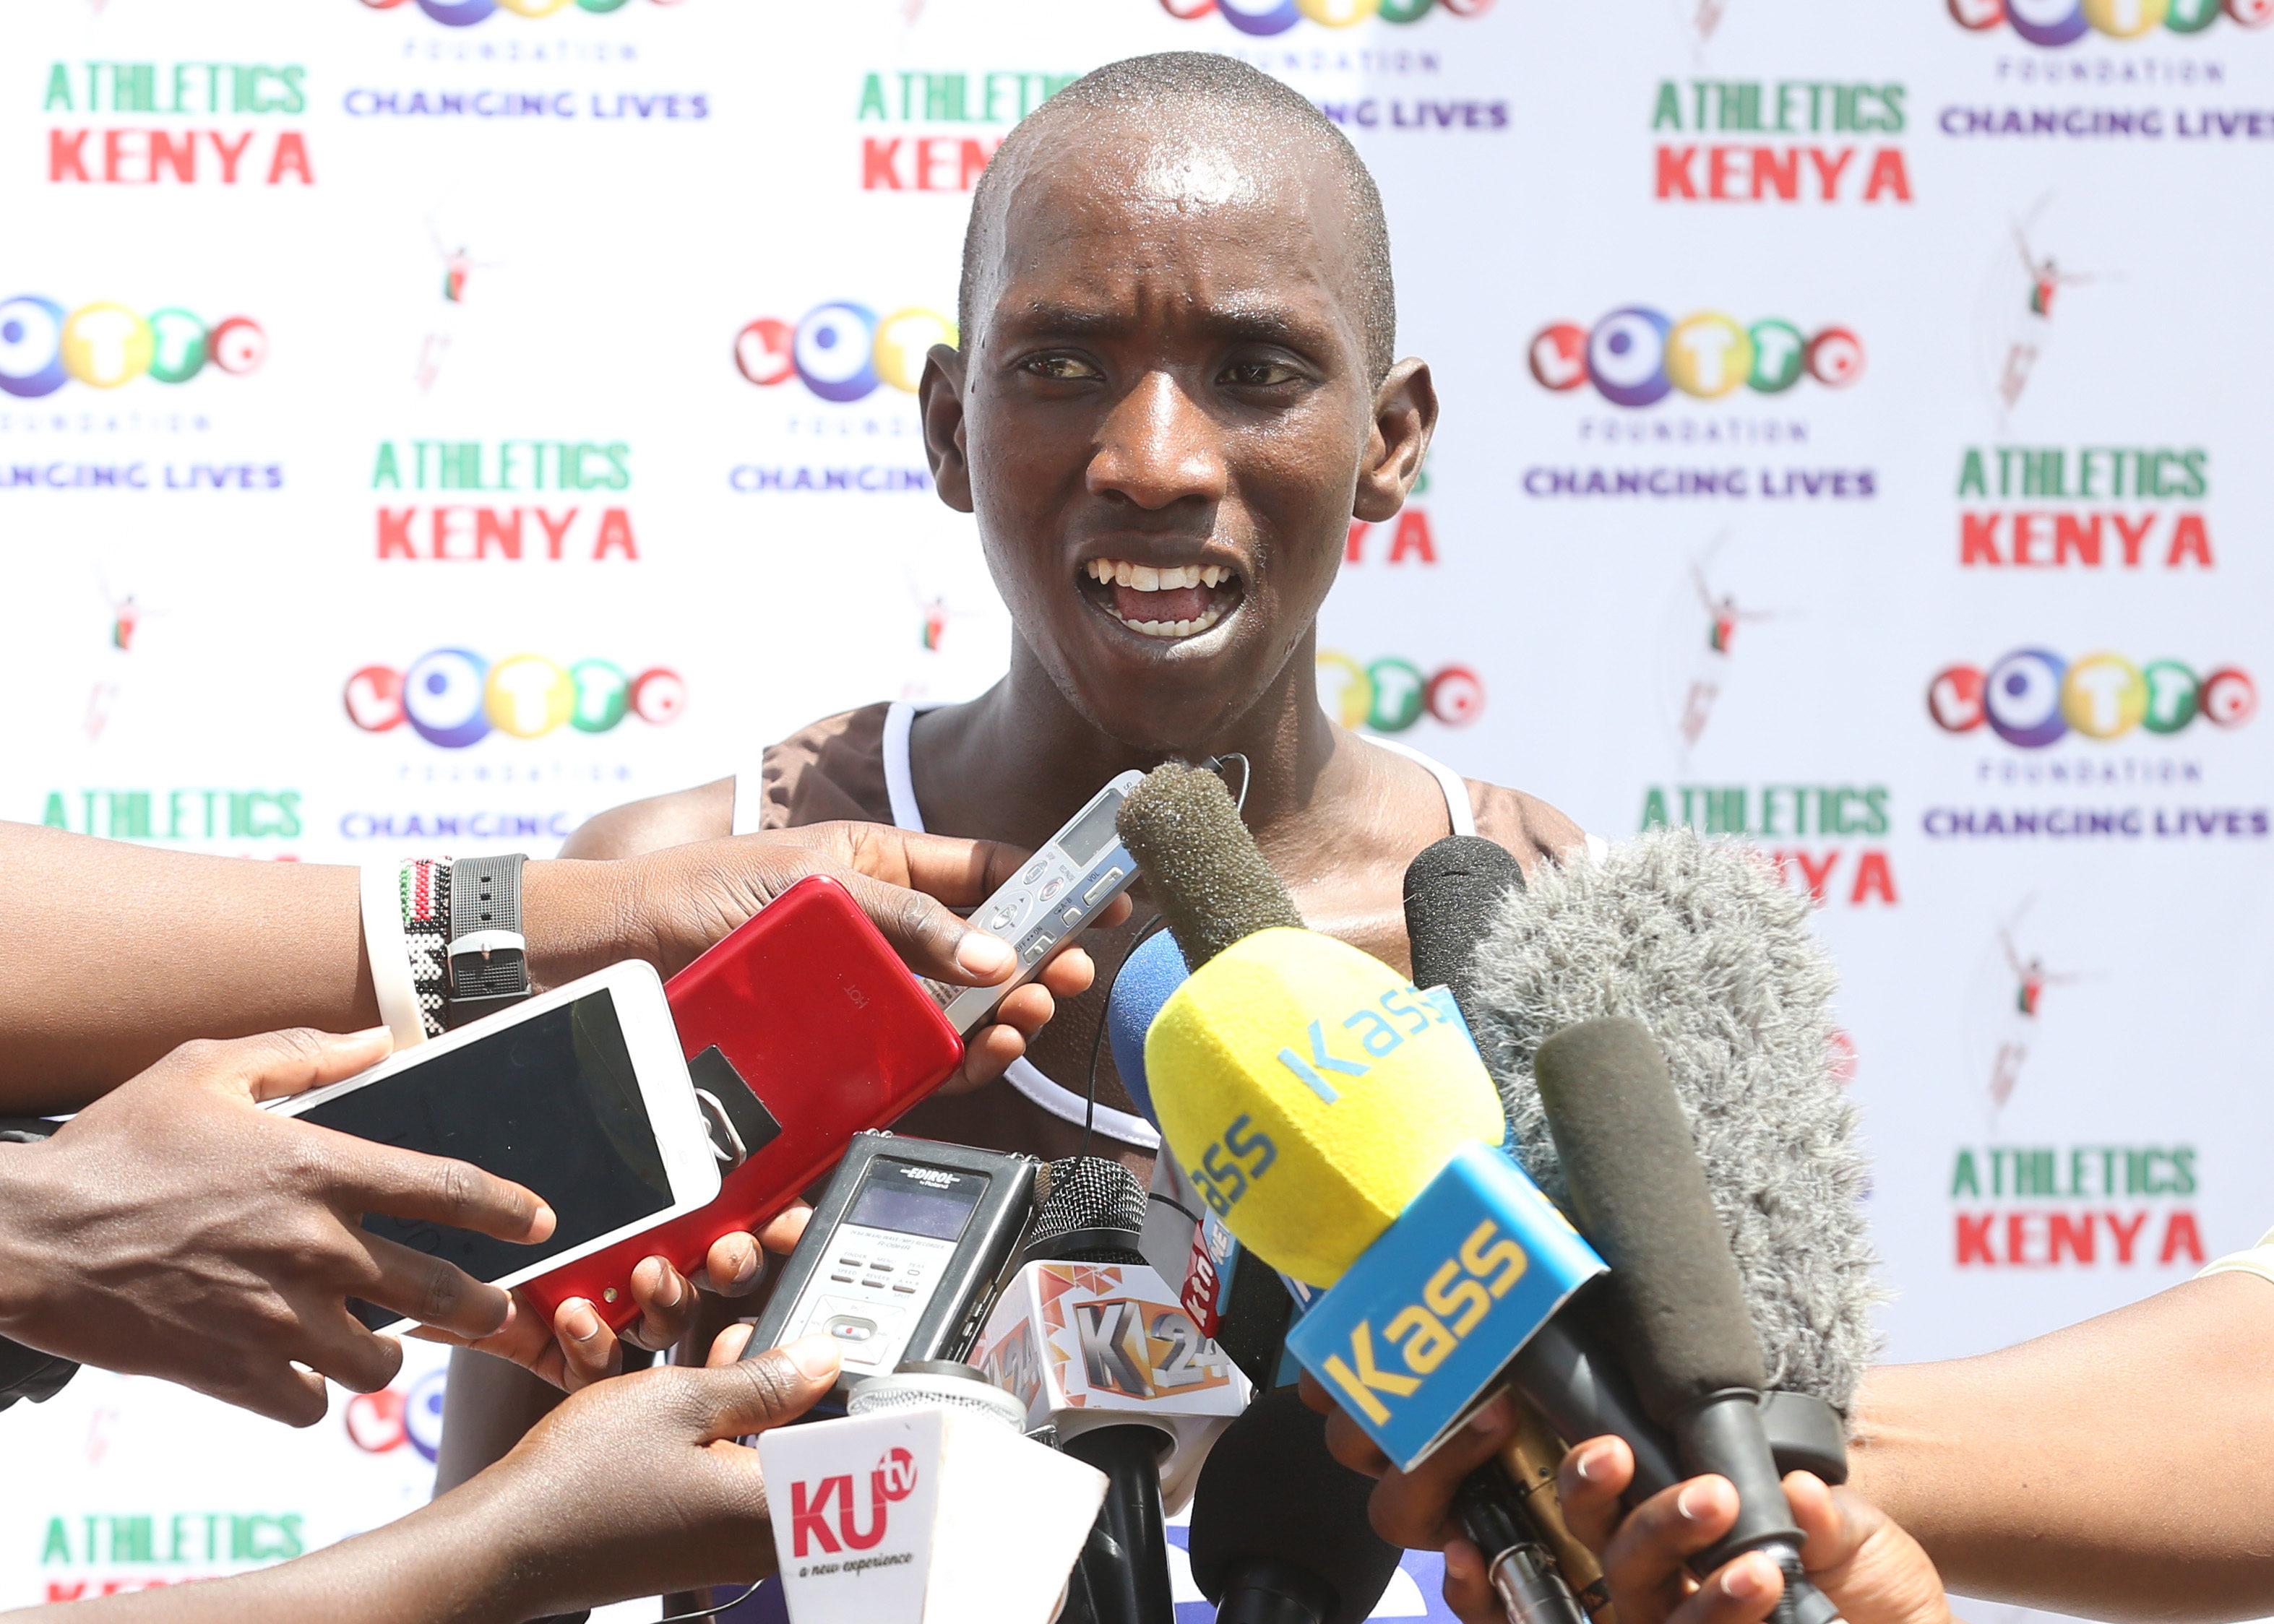 High Satisfaction with Athletics Kenya and Kenyan Athletes